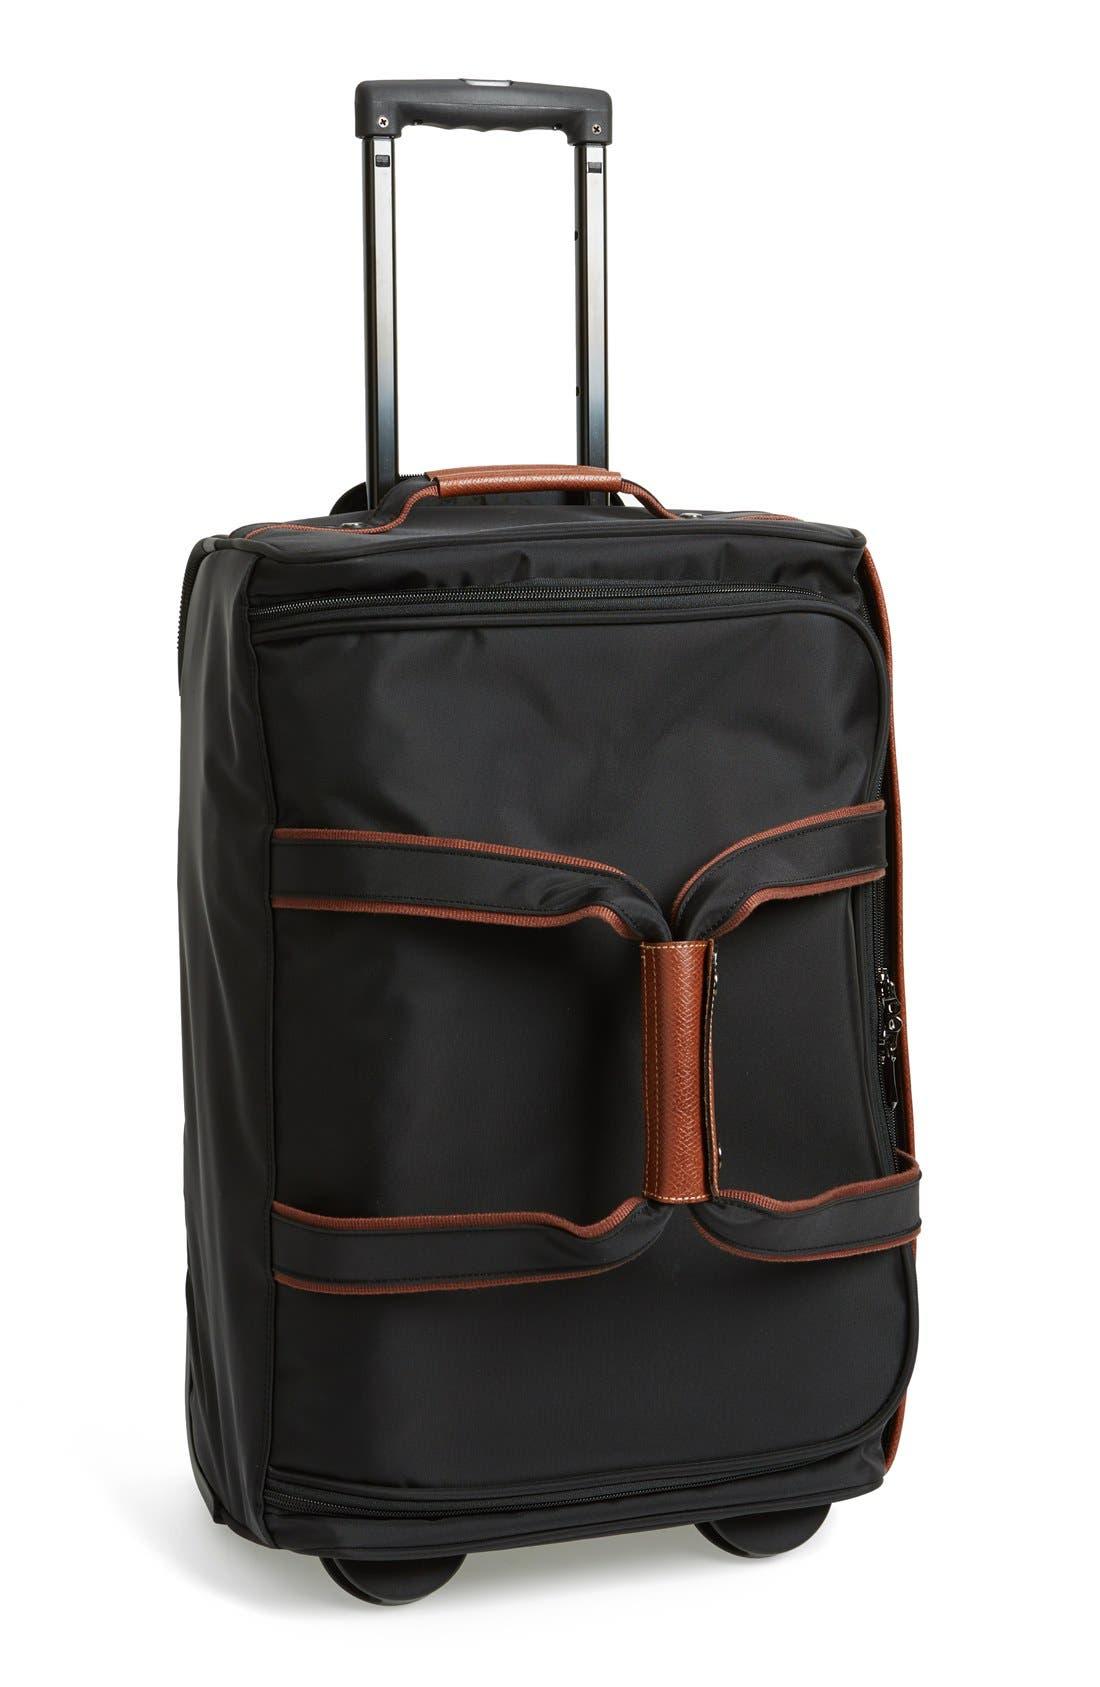 Main Image - Longchamp 'Small Le Pliage' Wheeled Travel Bag